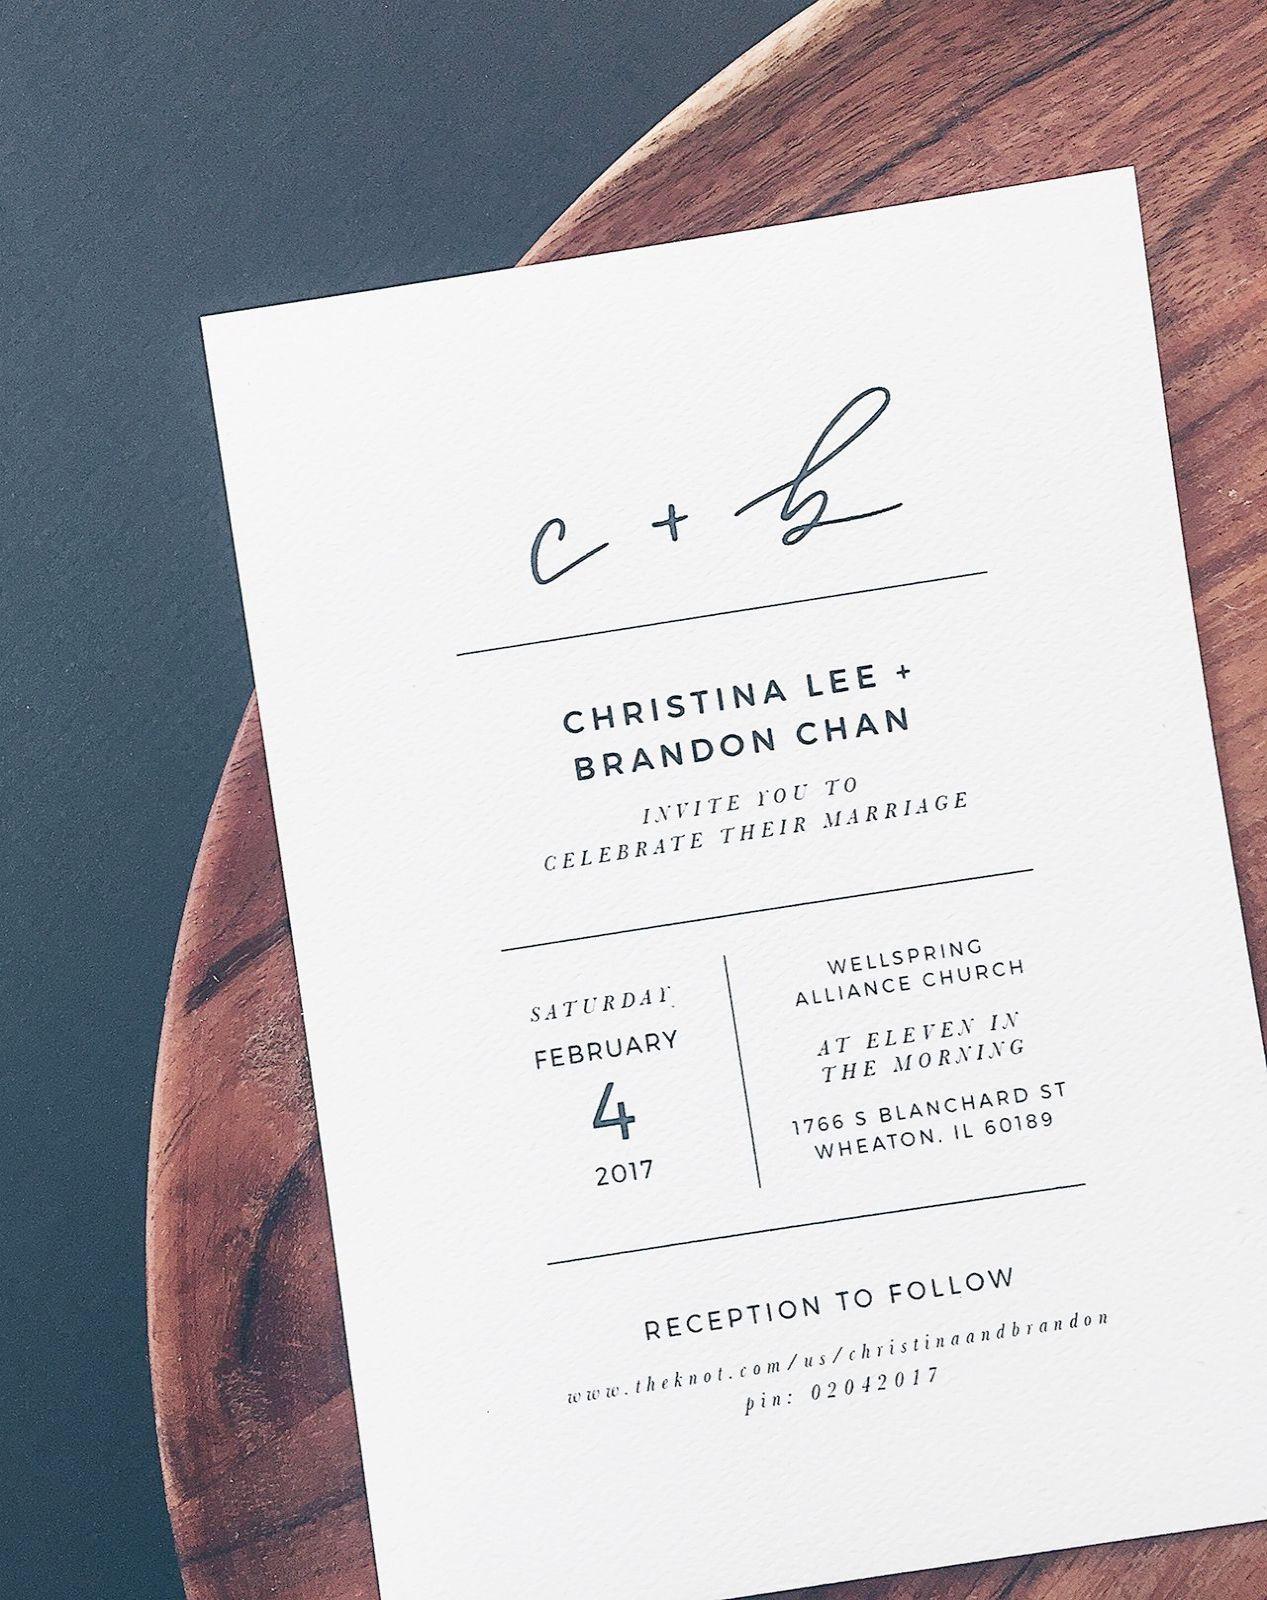 Interesting Wedding Invitations Cheap Canada Repin Classy Wedding Invitations Minimalist Wedding Invitations Hand Lettered Wedding Invitations